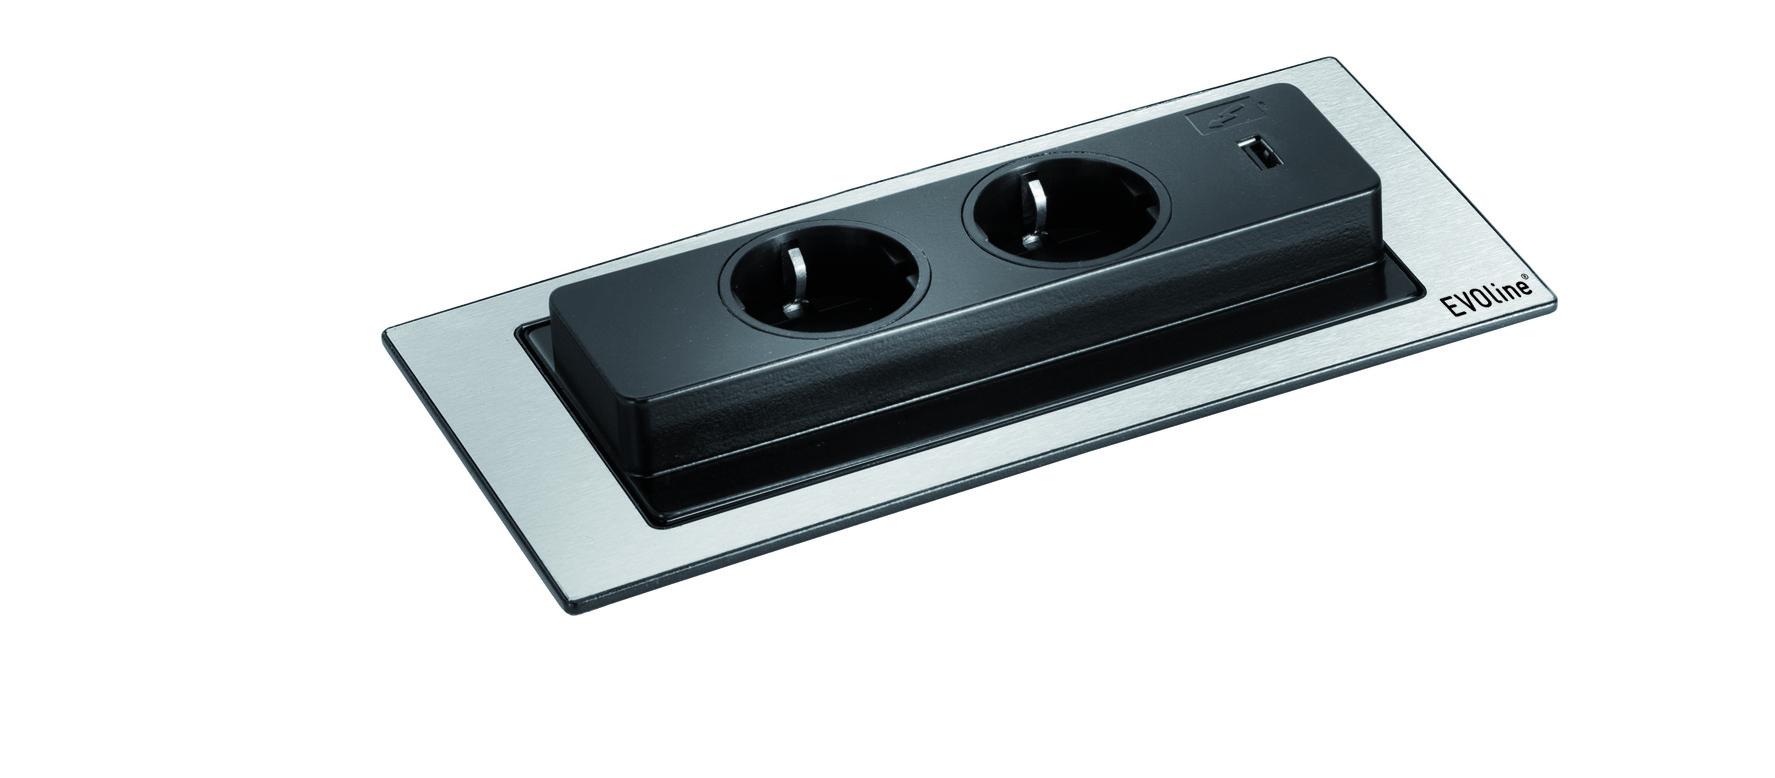 Einbausteckdose mit USB-Charger Evoline BackFlip